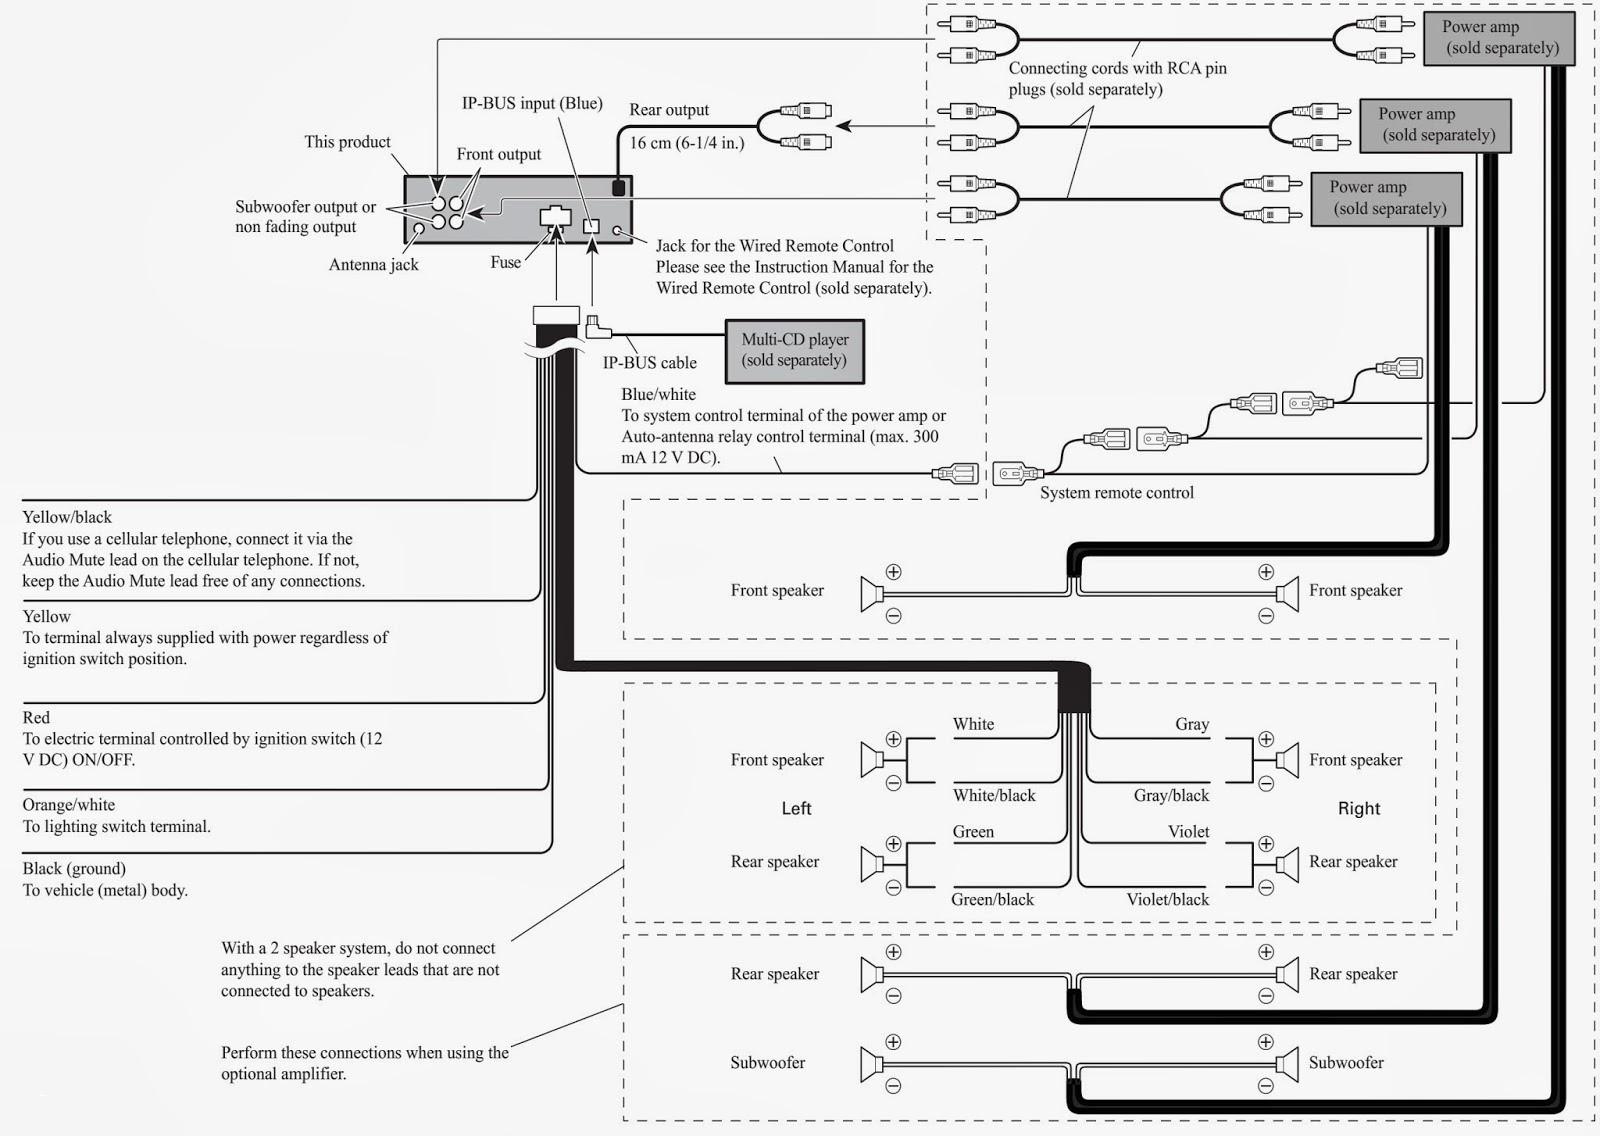 Pioneer Wiring Harness Diagram Best Pioneer Deh 1600 Wiring Diagram Free Download and 1900mp